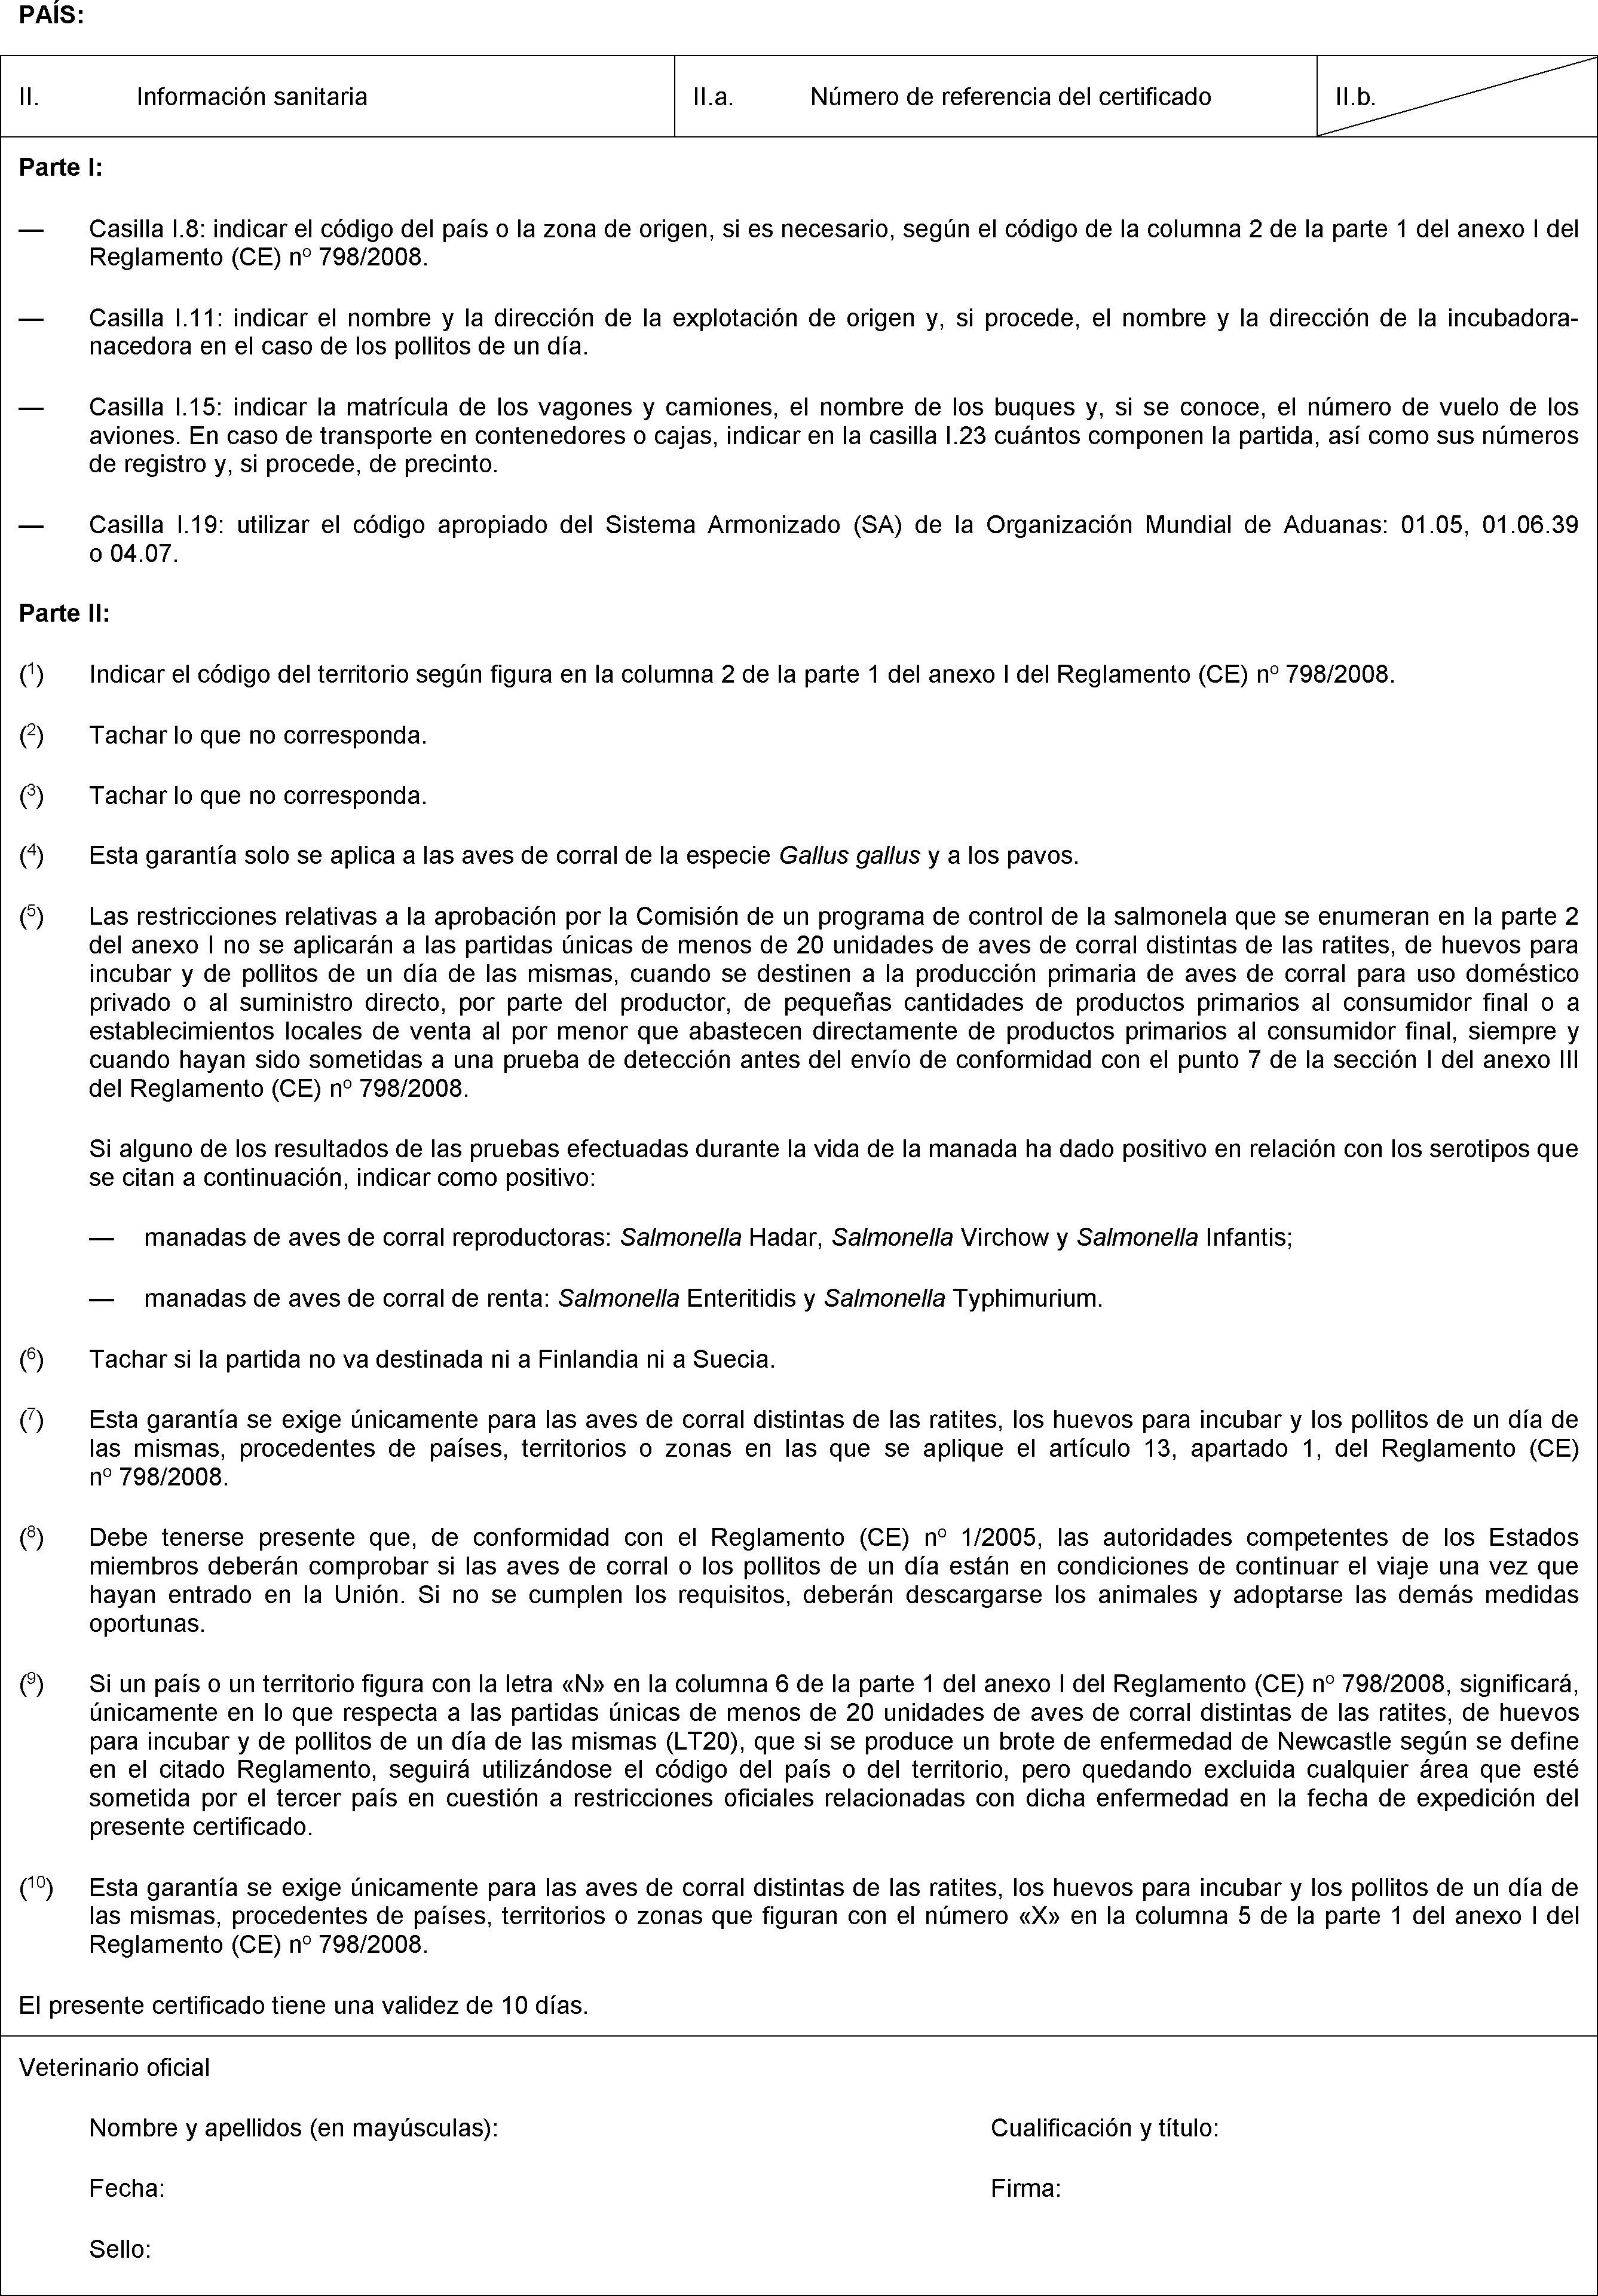 EUR-Lex - 02008R0798-20170324 - EN - EUR-Lex